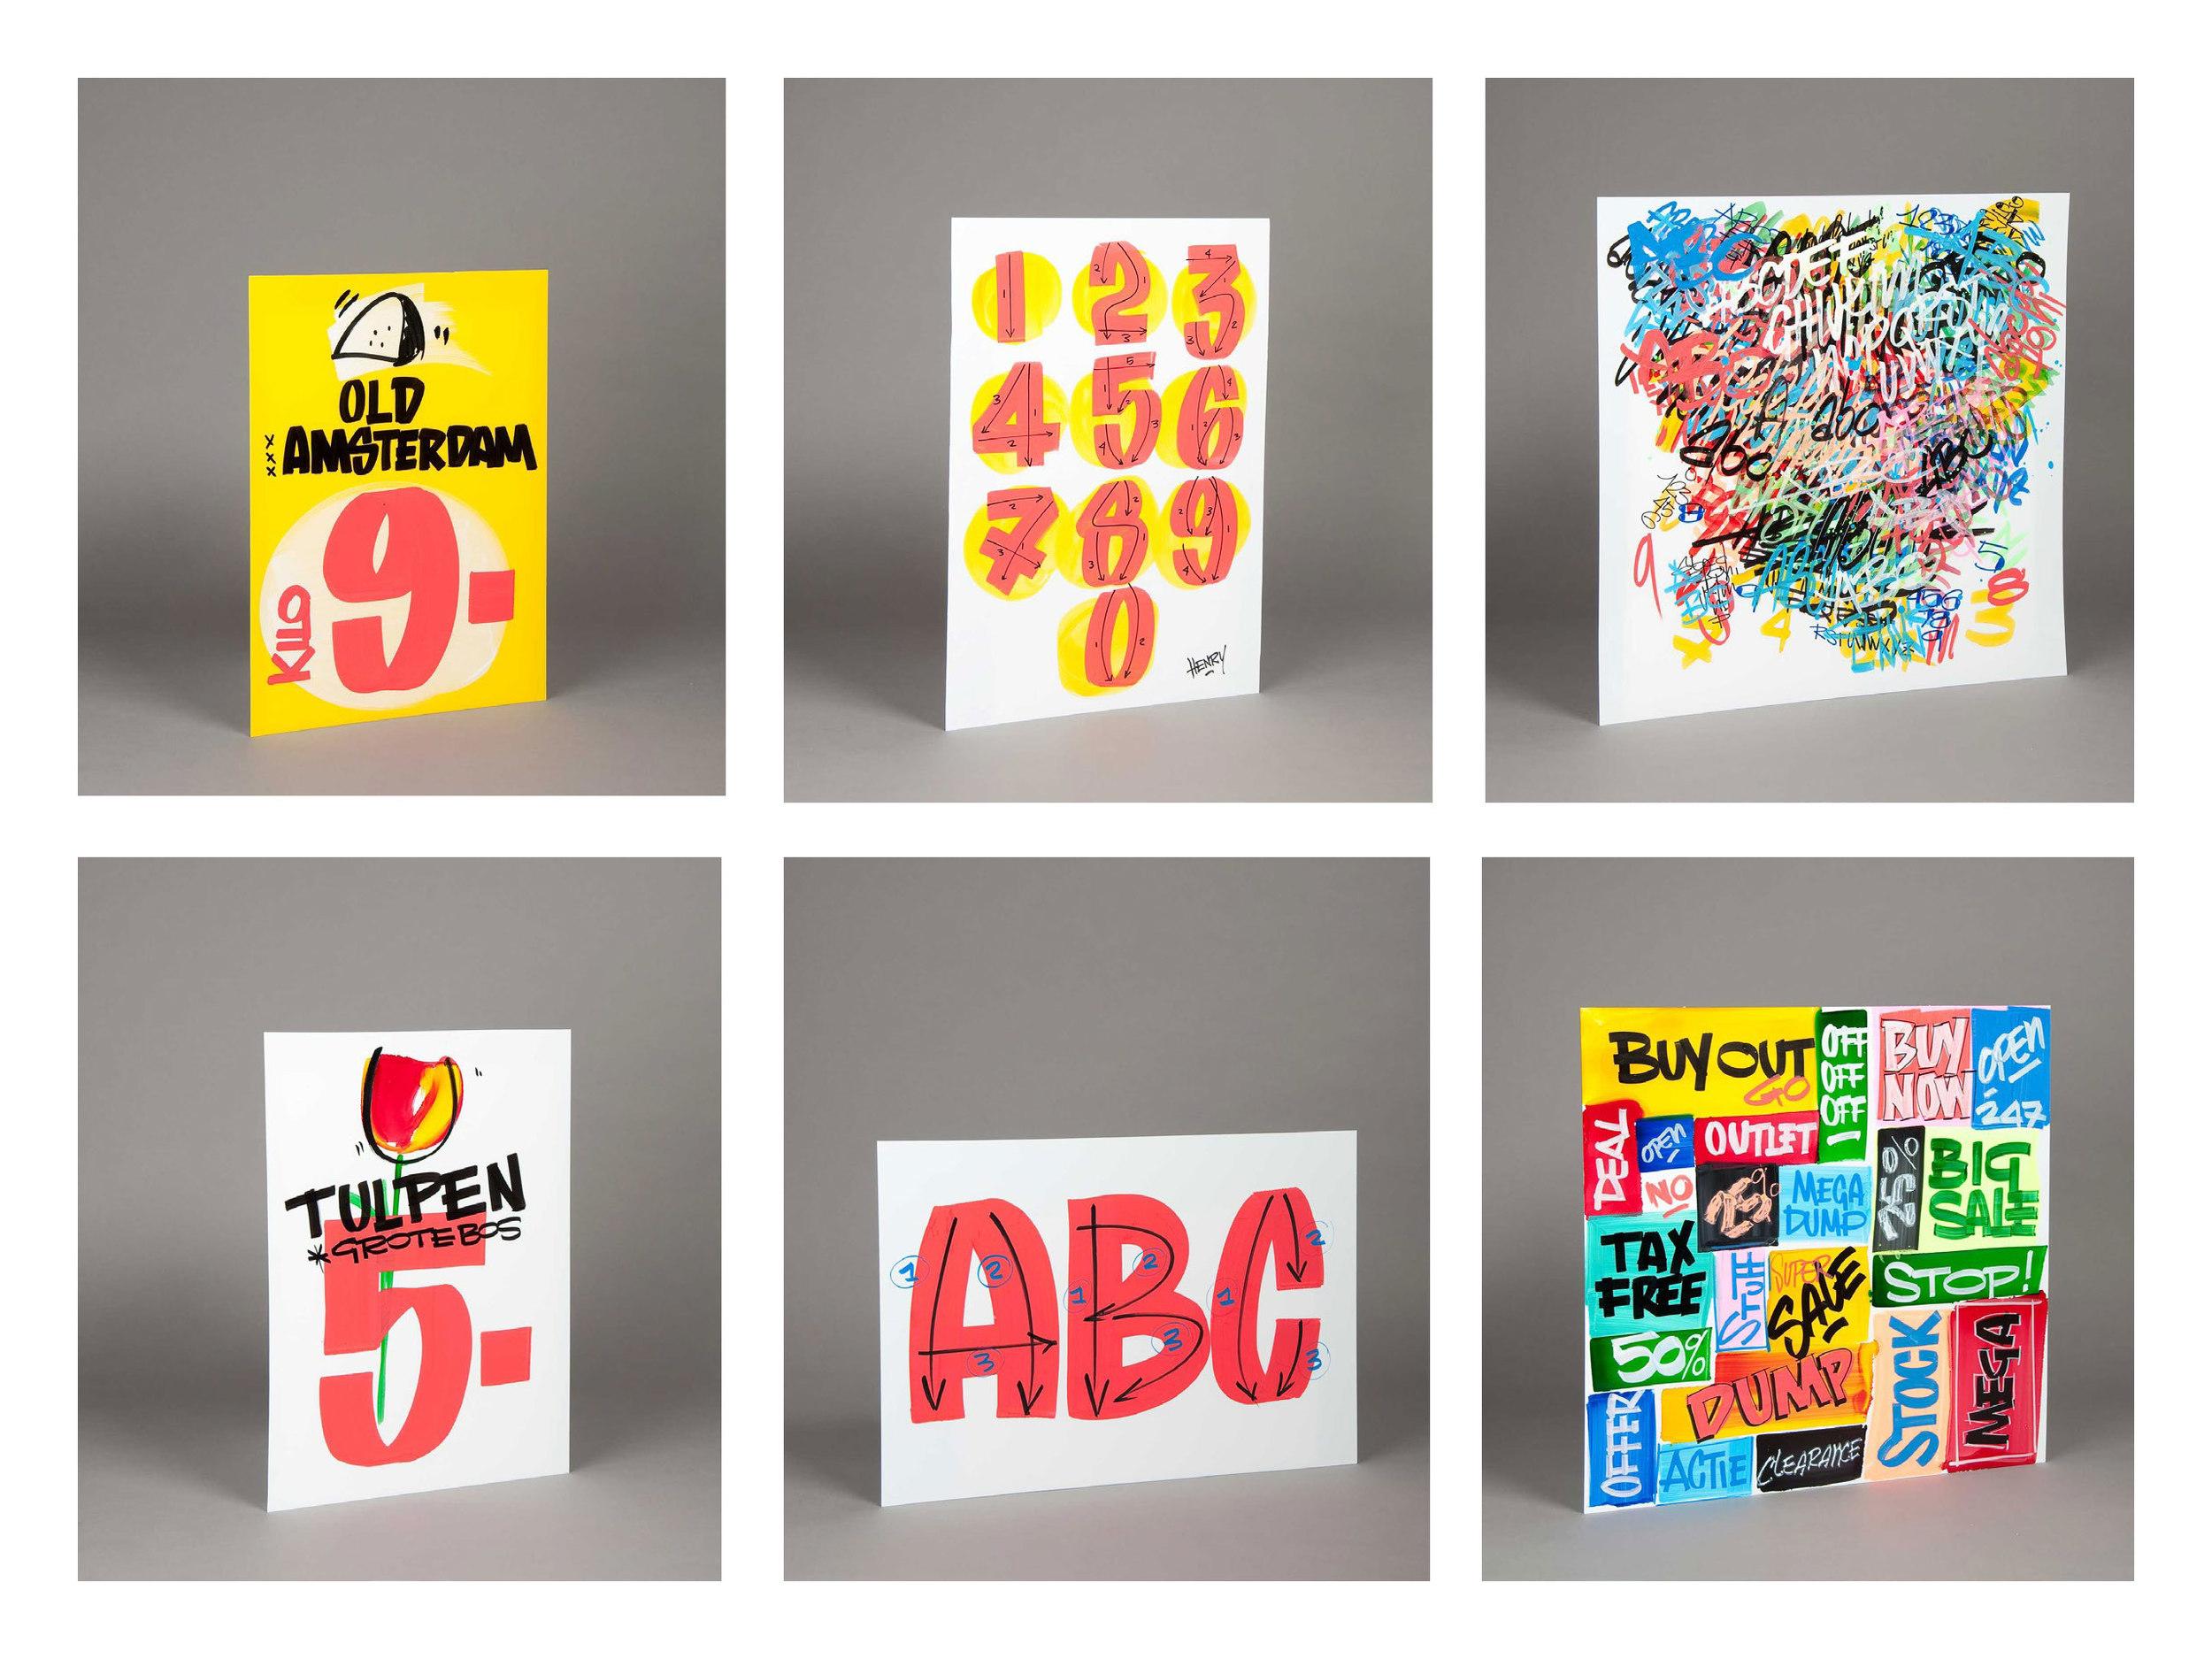 studio_sigmon_henry_sign_painter_shop_